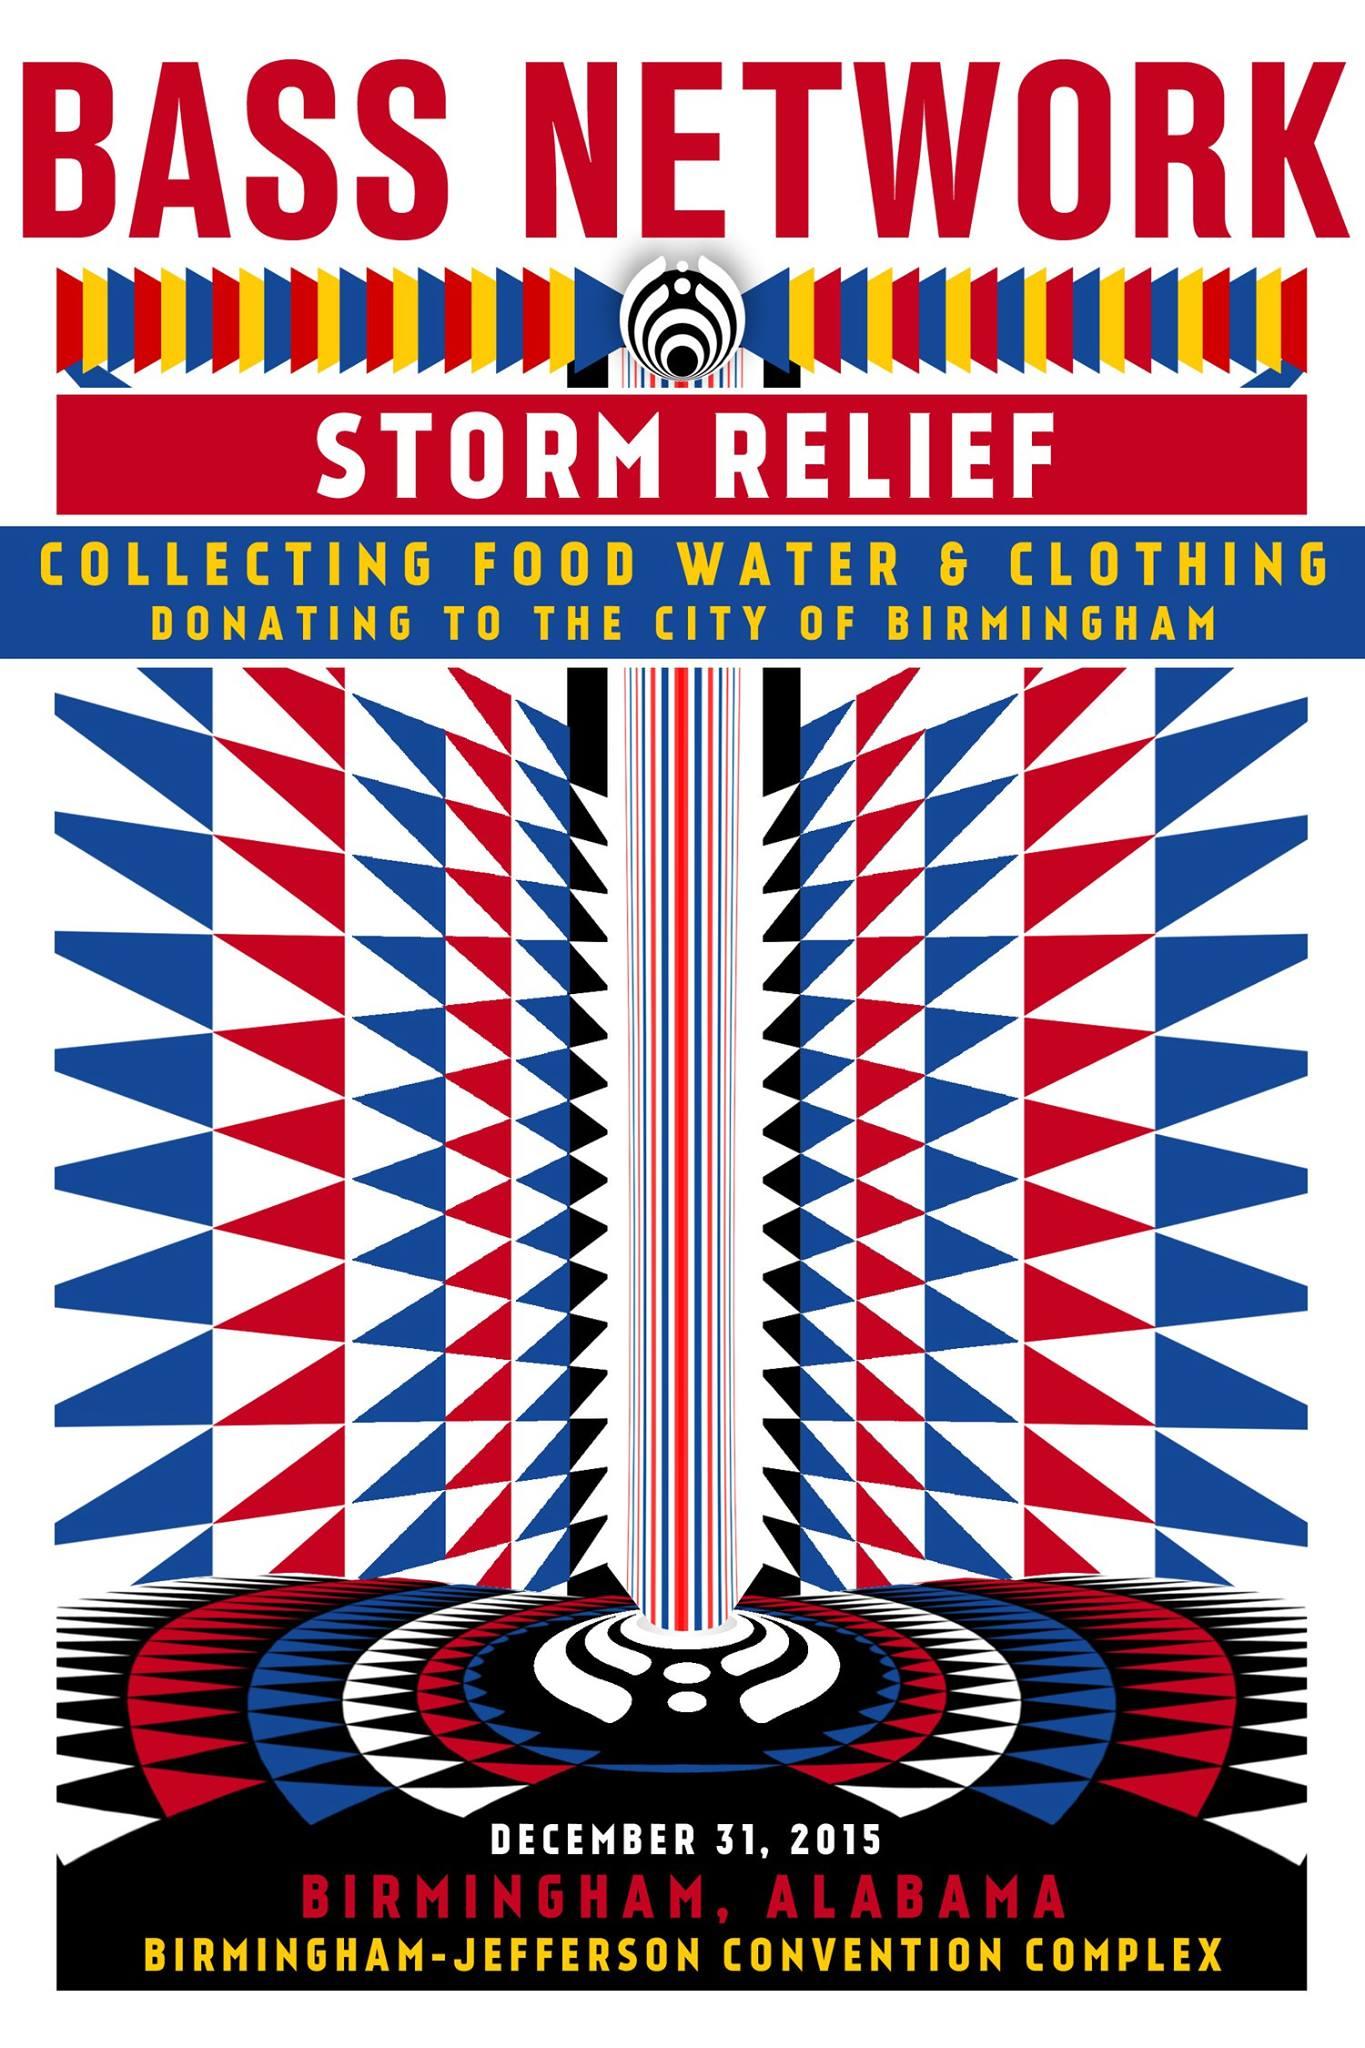 BNet Storm Relief Drive